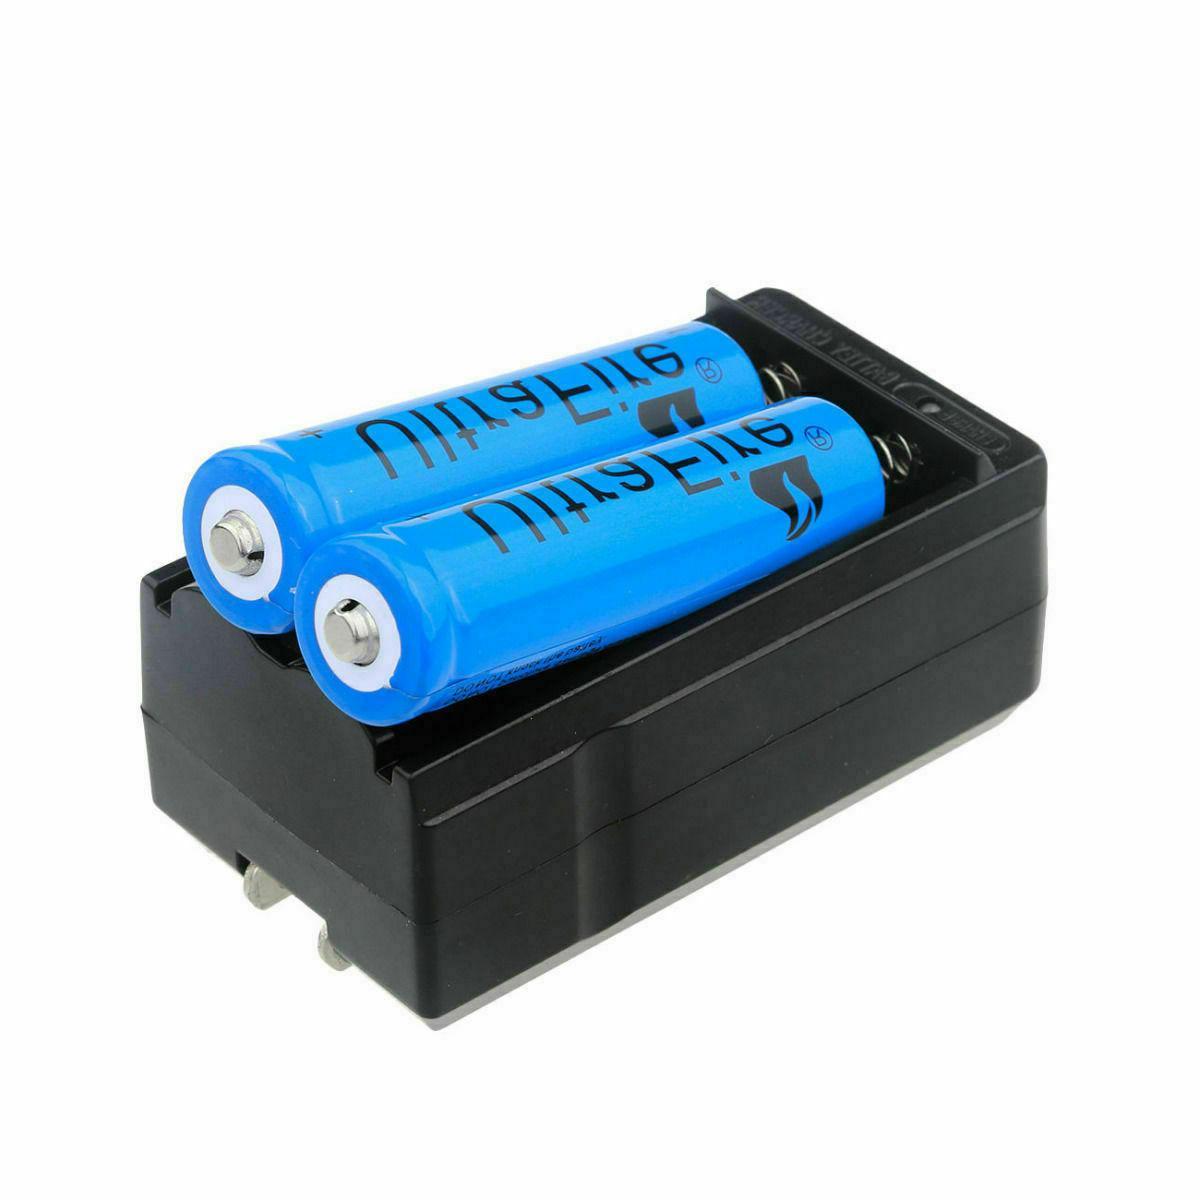 UltraFire 18650 Battery 5000mAh Li-ion LED Flashlight